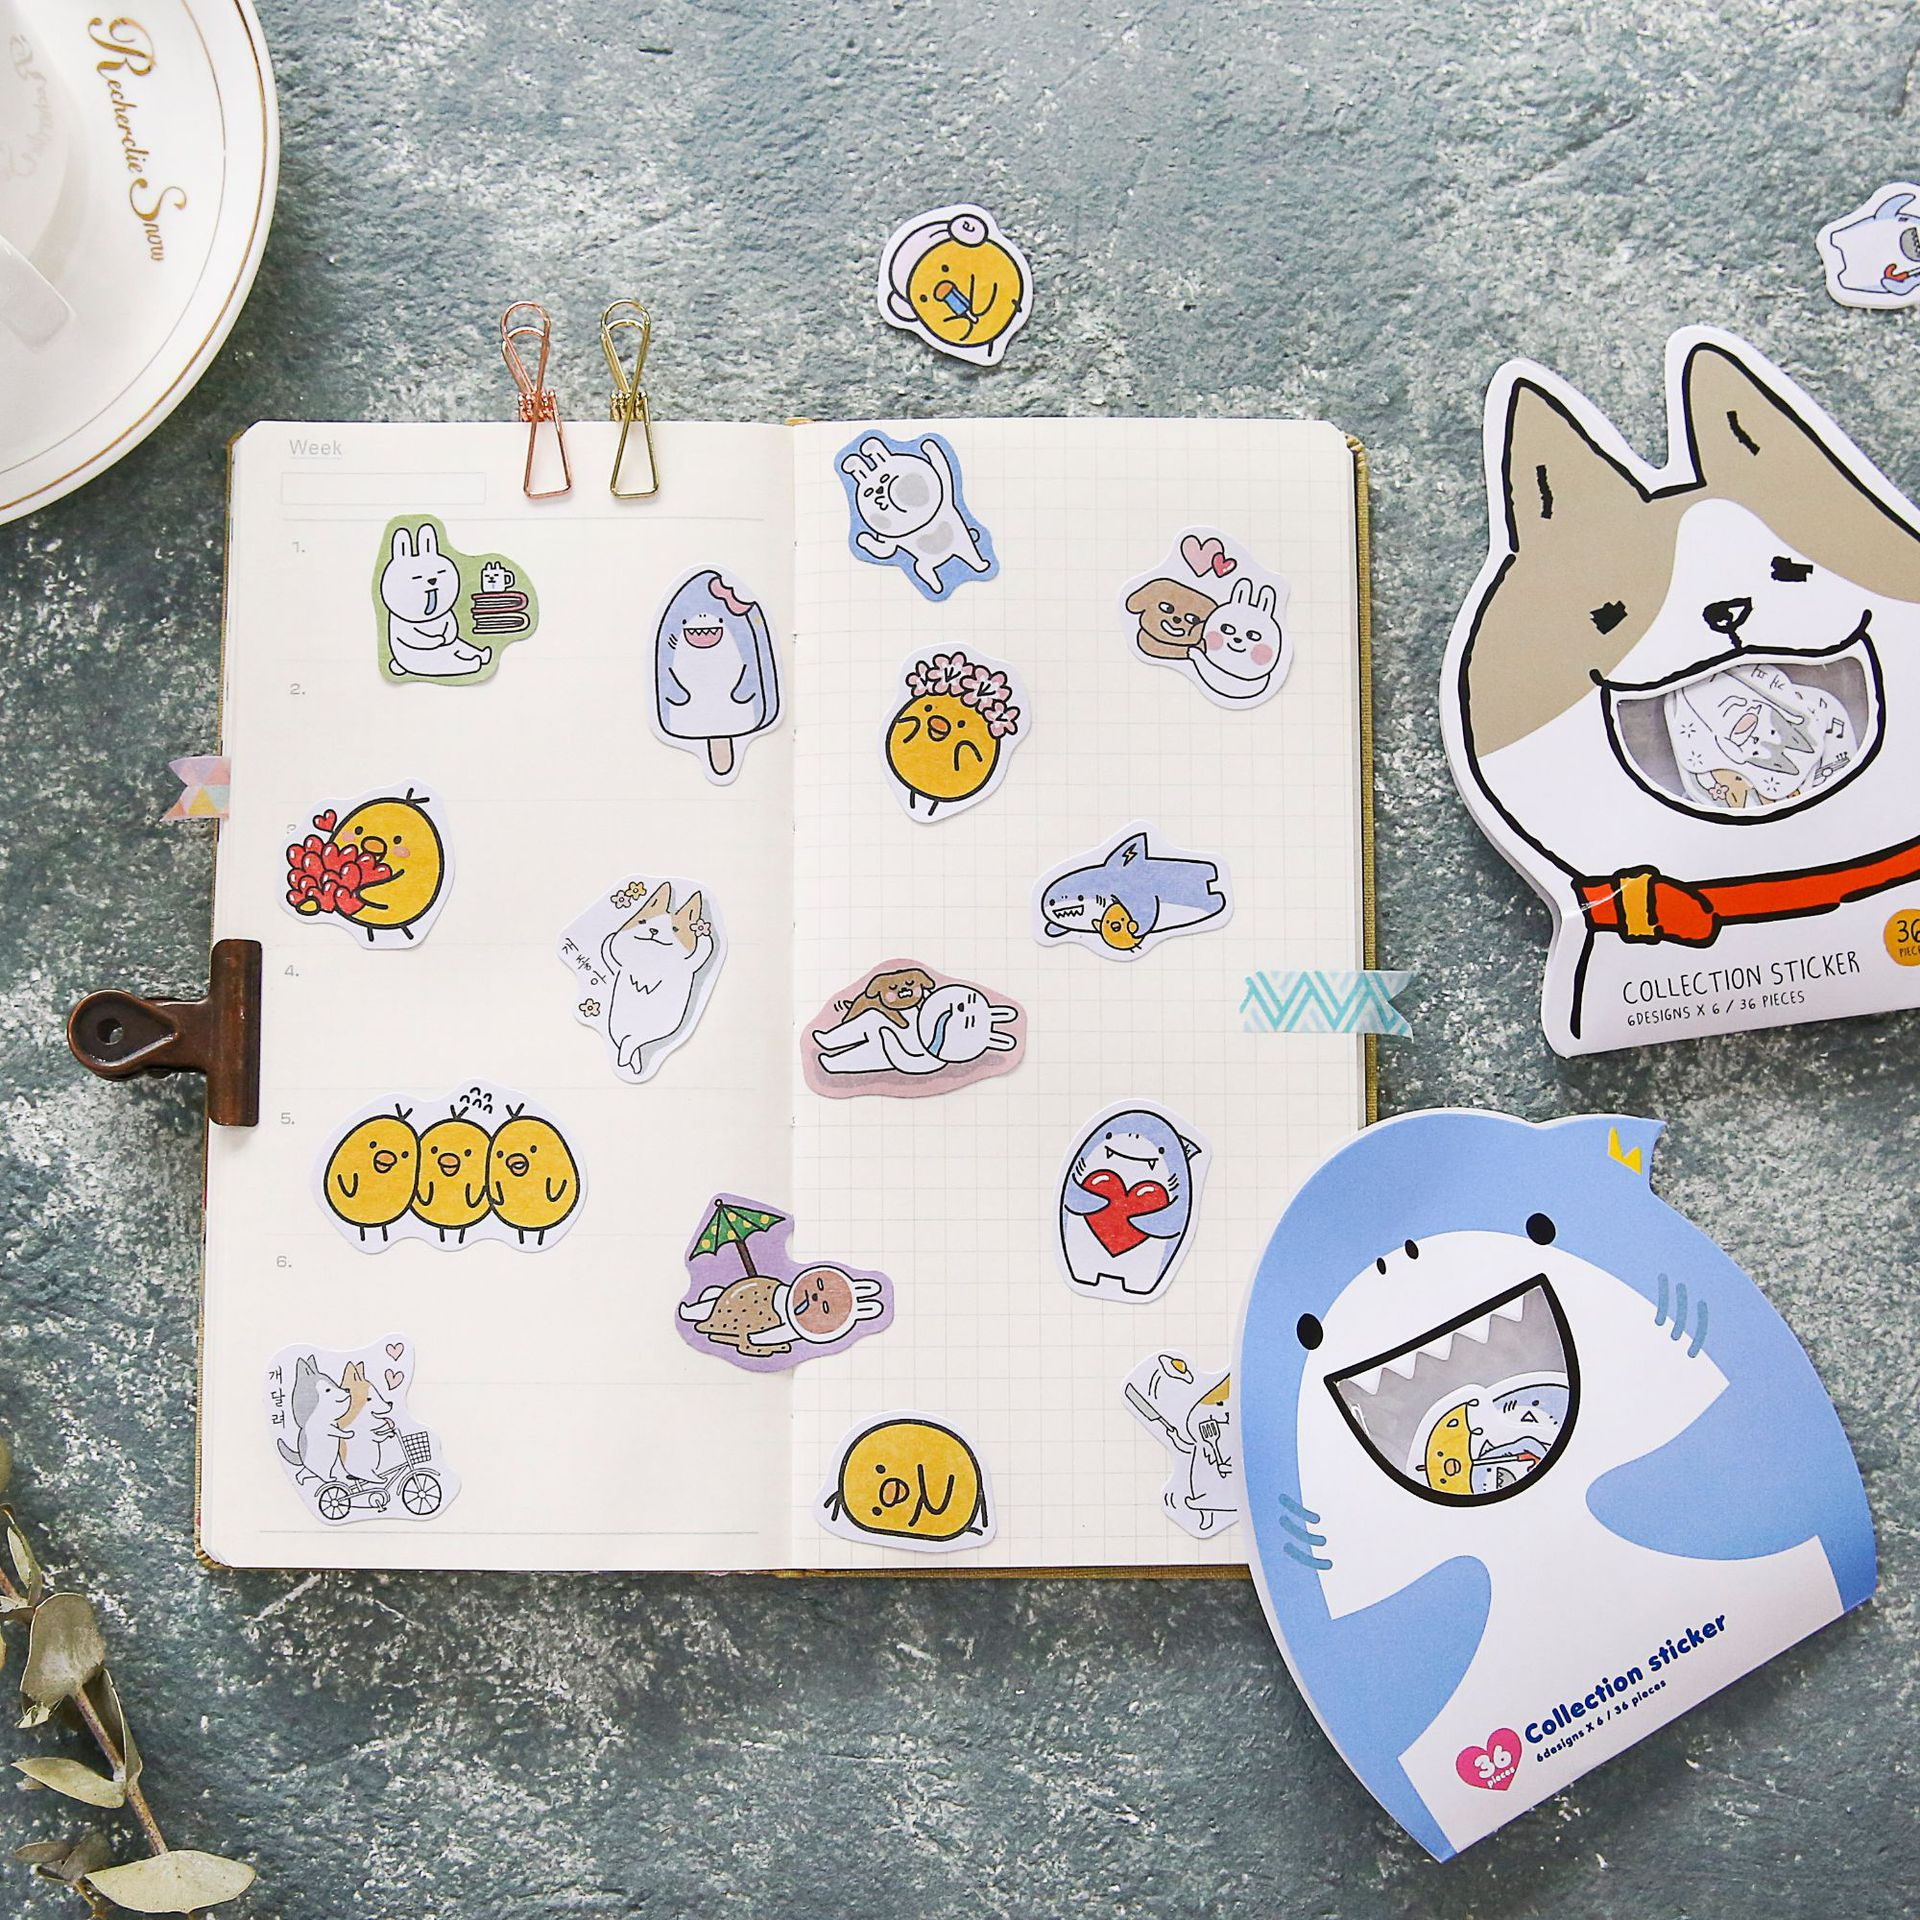 Line Friend Cute PVC Clear Sticker Flakes Kawaii Cartoon Bunny Corgi Shark Stickers Scrapbook Journal Stickers Korean Stationery